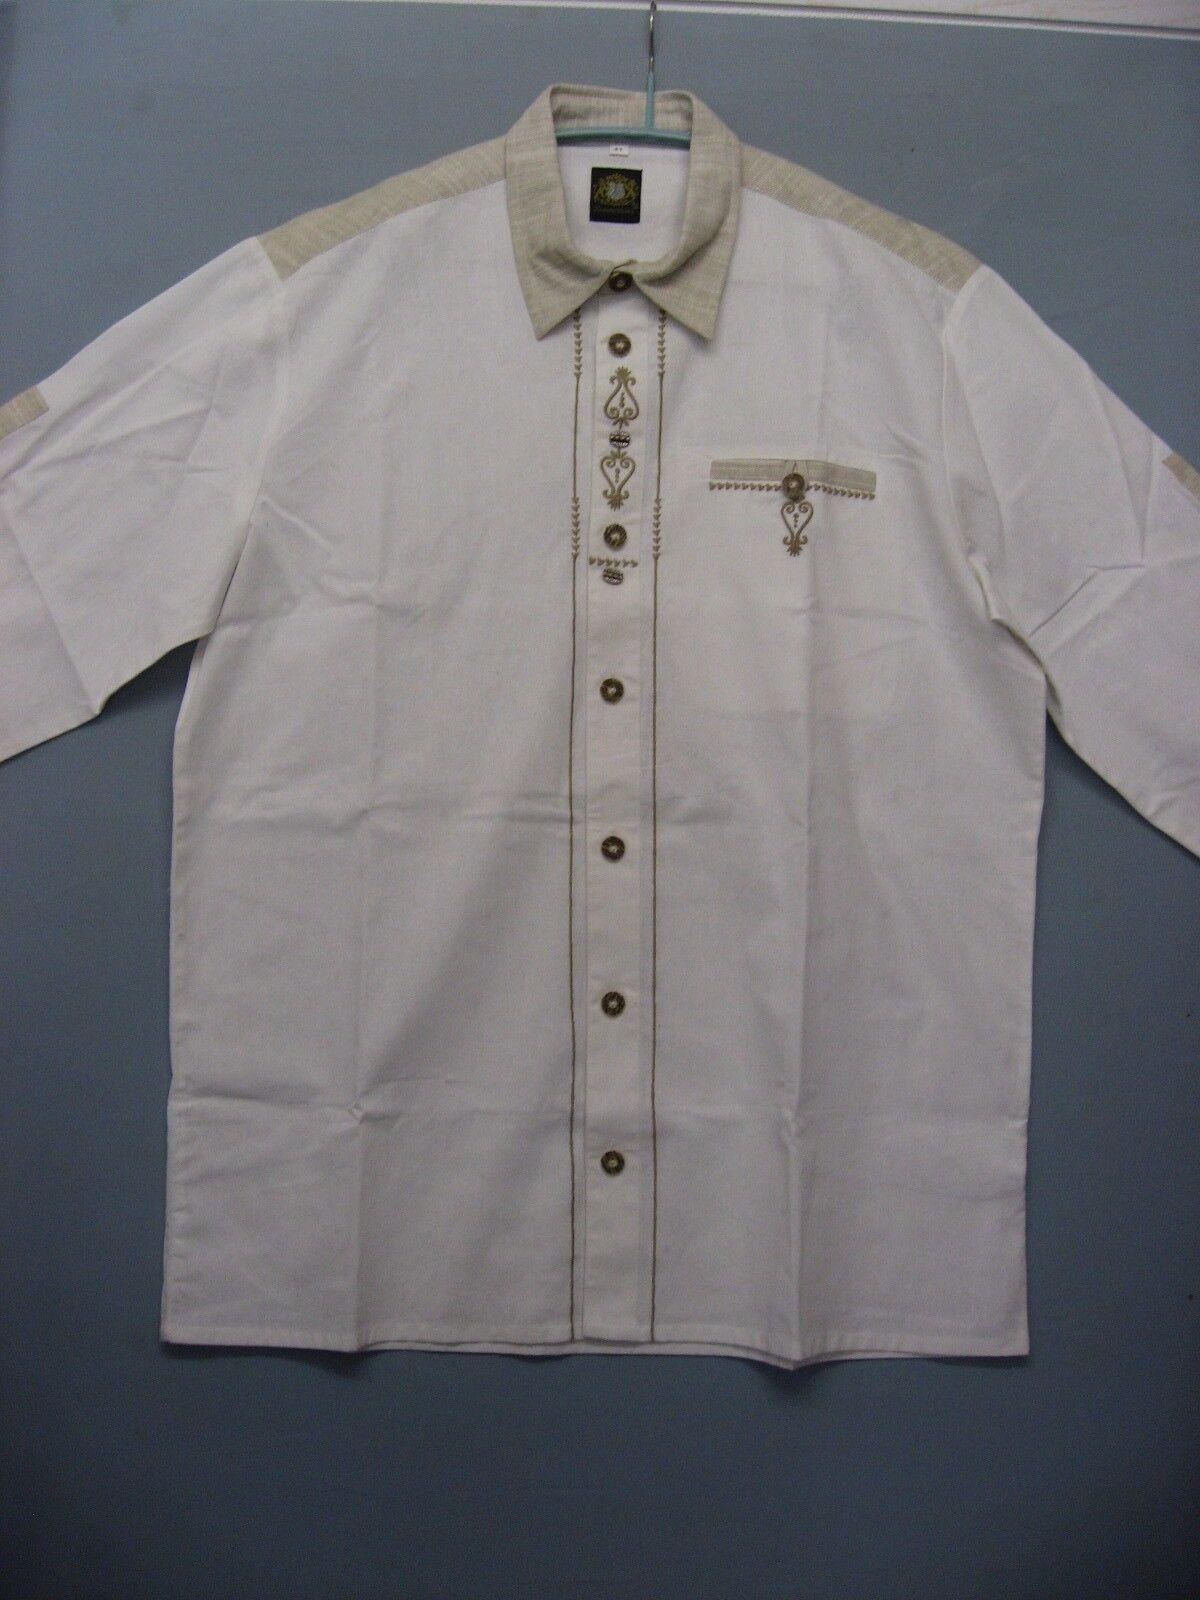 *4* HAMMERSCHMID Herren Trachtenhemd, Creme-Weiß, Gr. 41 NEU